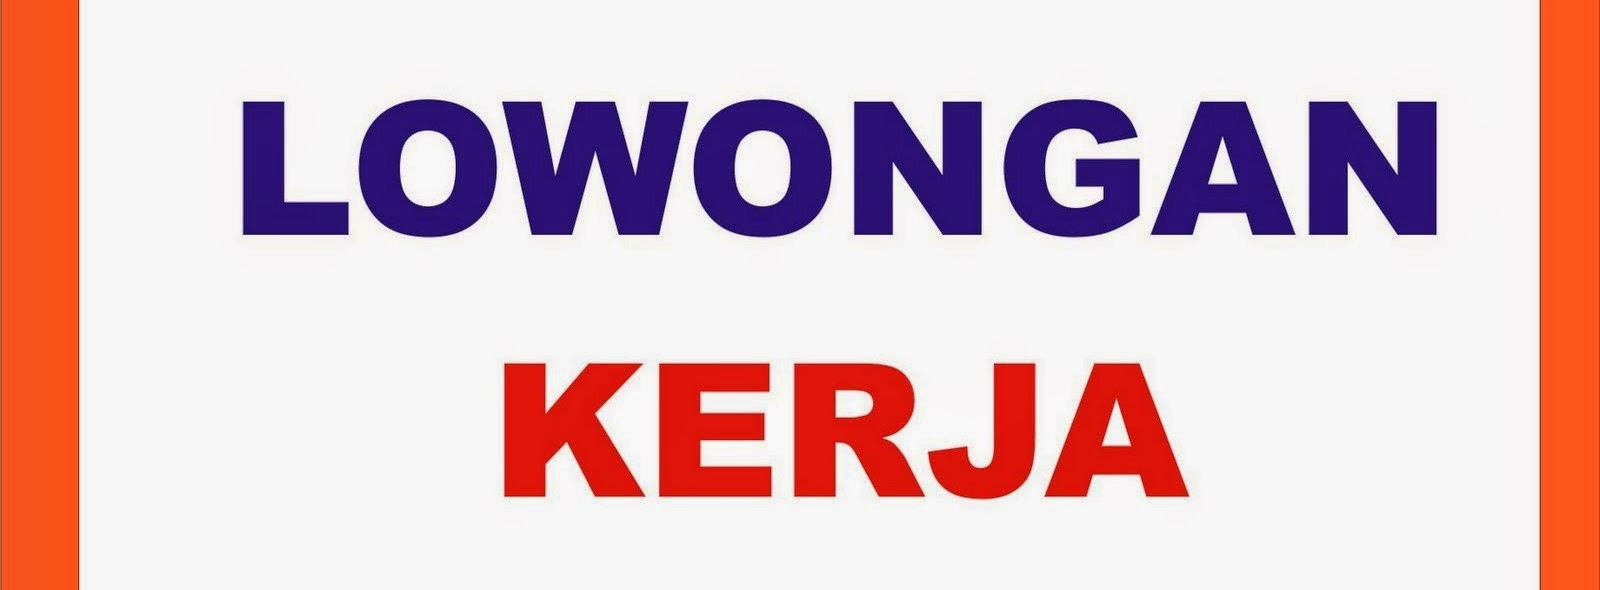 Lowongan Kerja Jakarta Timur  Wisata Dan Info Sumbar